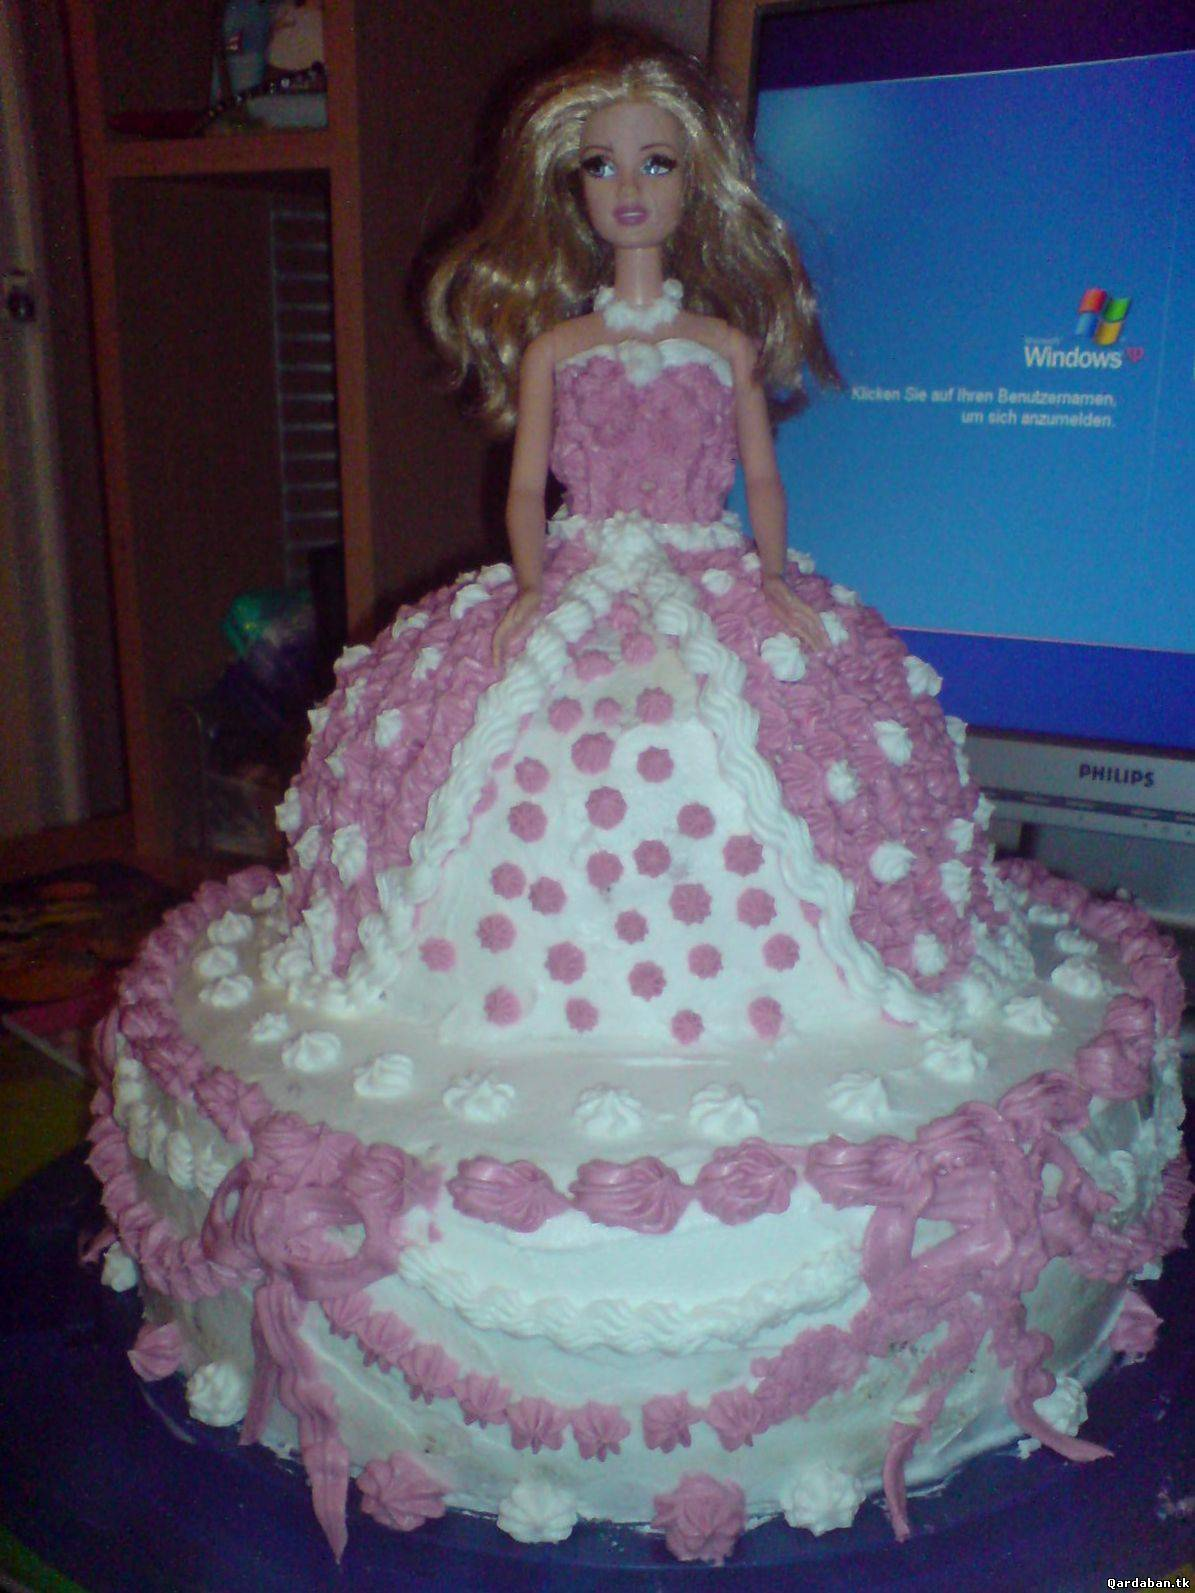 Рецепт торта барби в домашних условиях из крема или из сливок